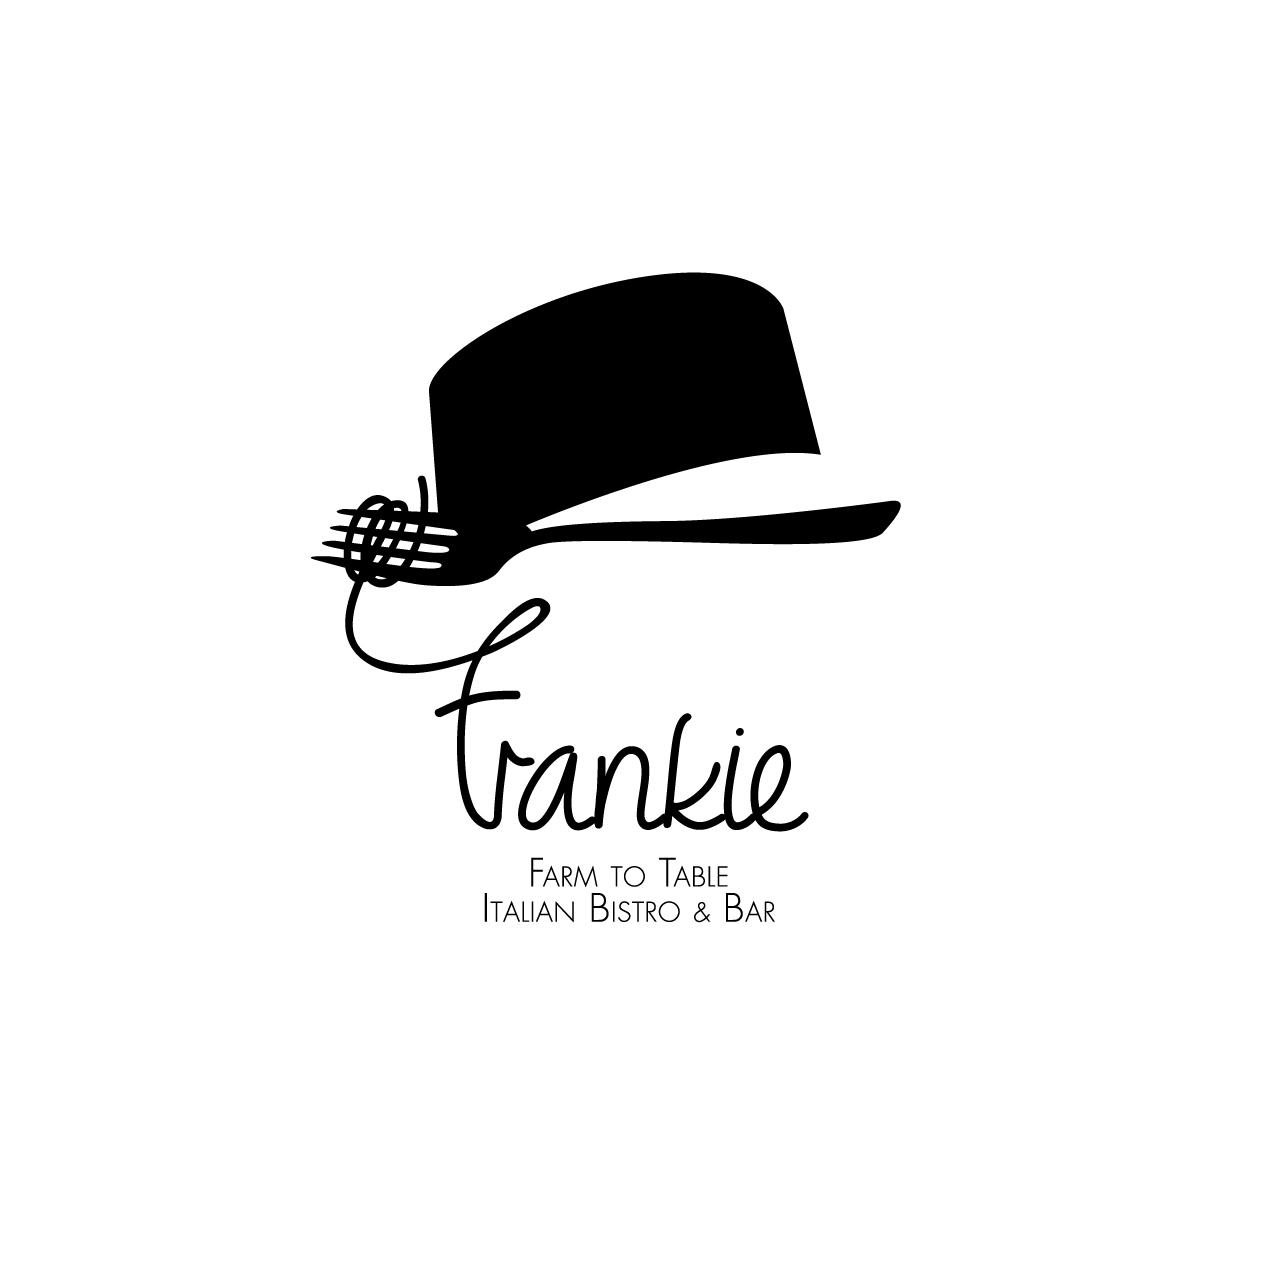 Frankie Restaurant Brand Identity A3 Resizing Ideas